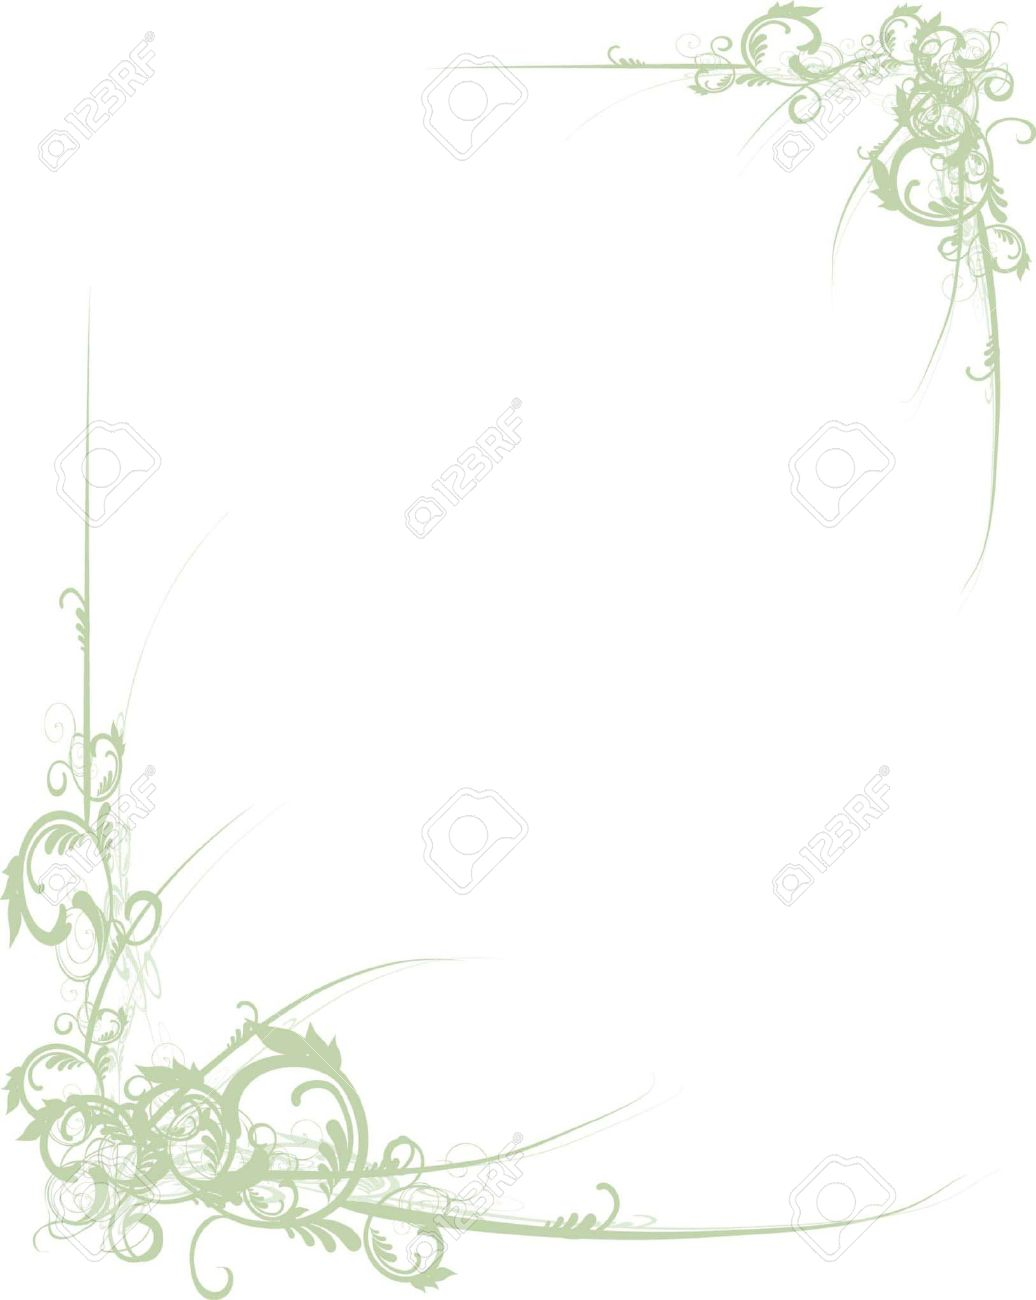 vine divider clipart - Clip Art Library